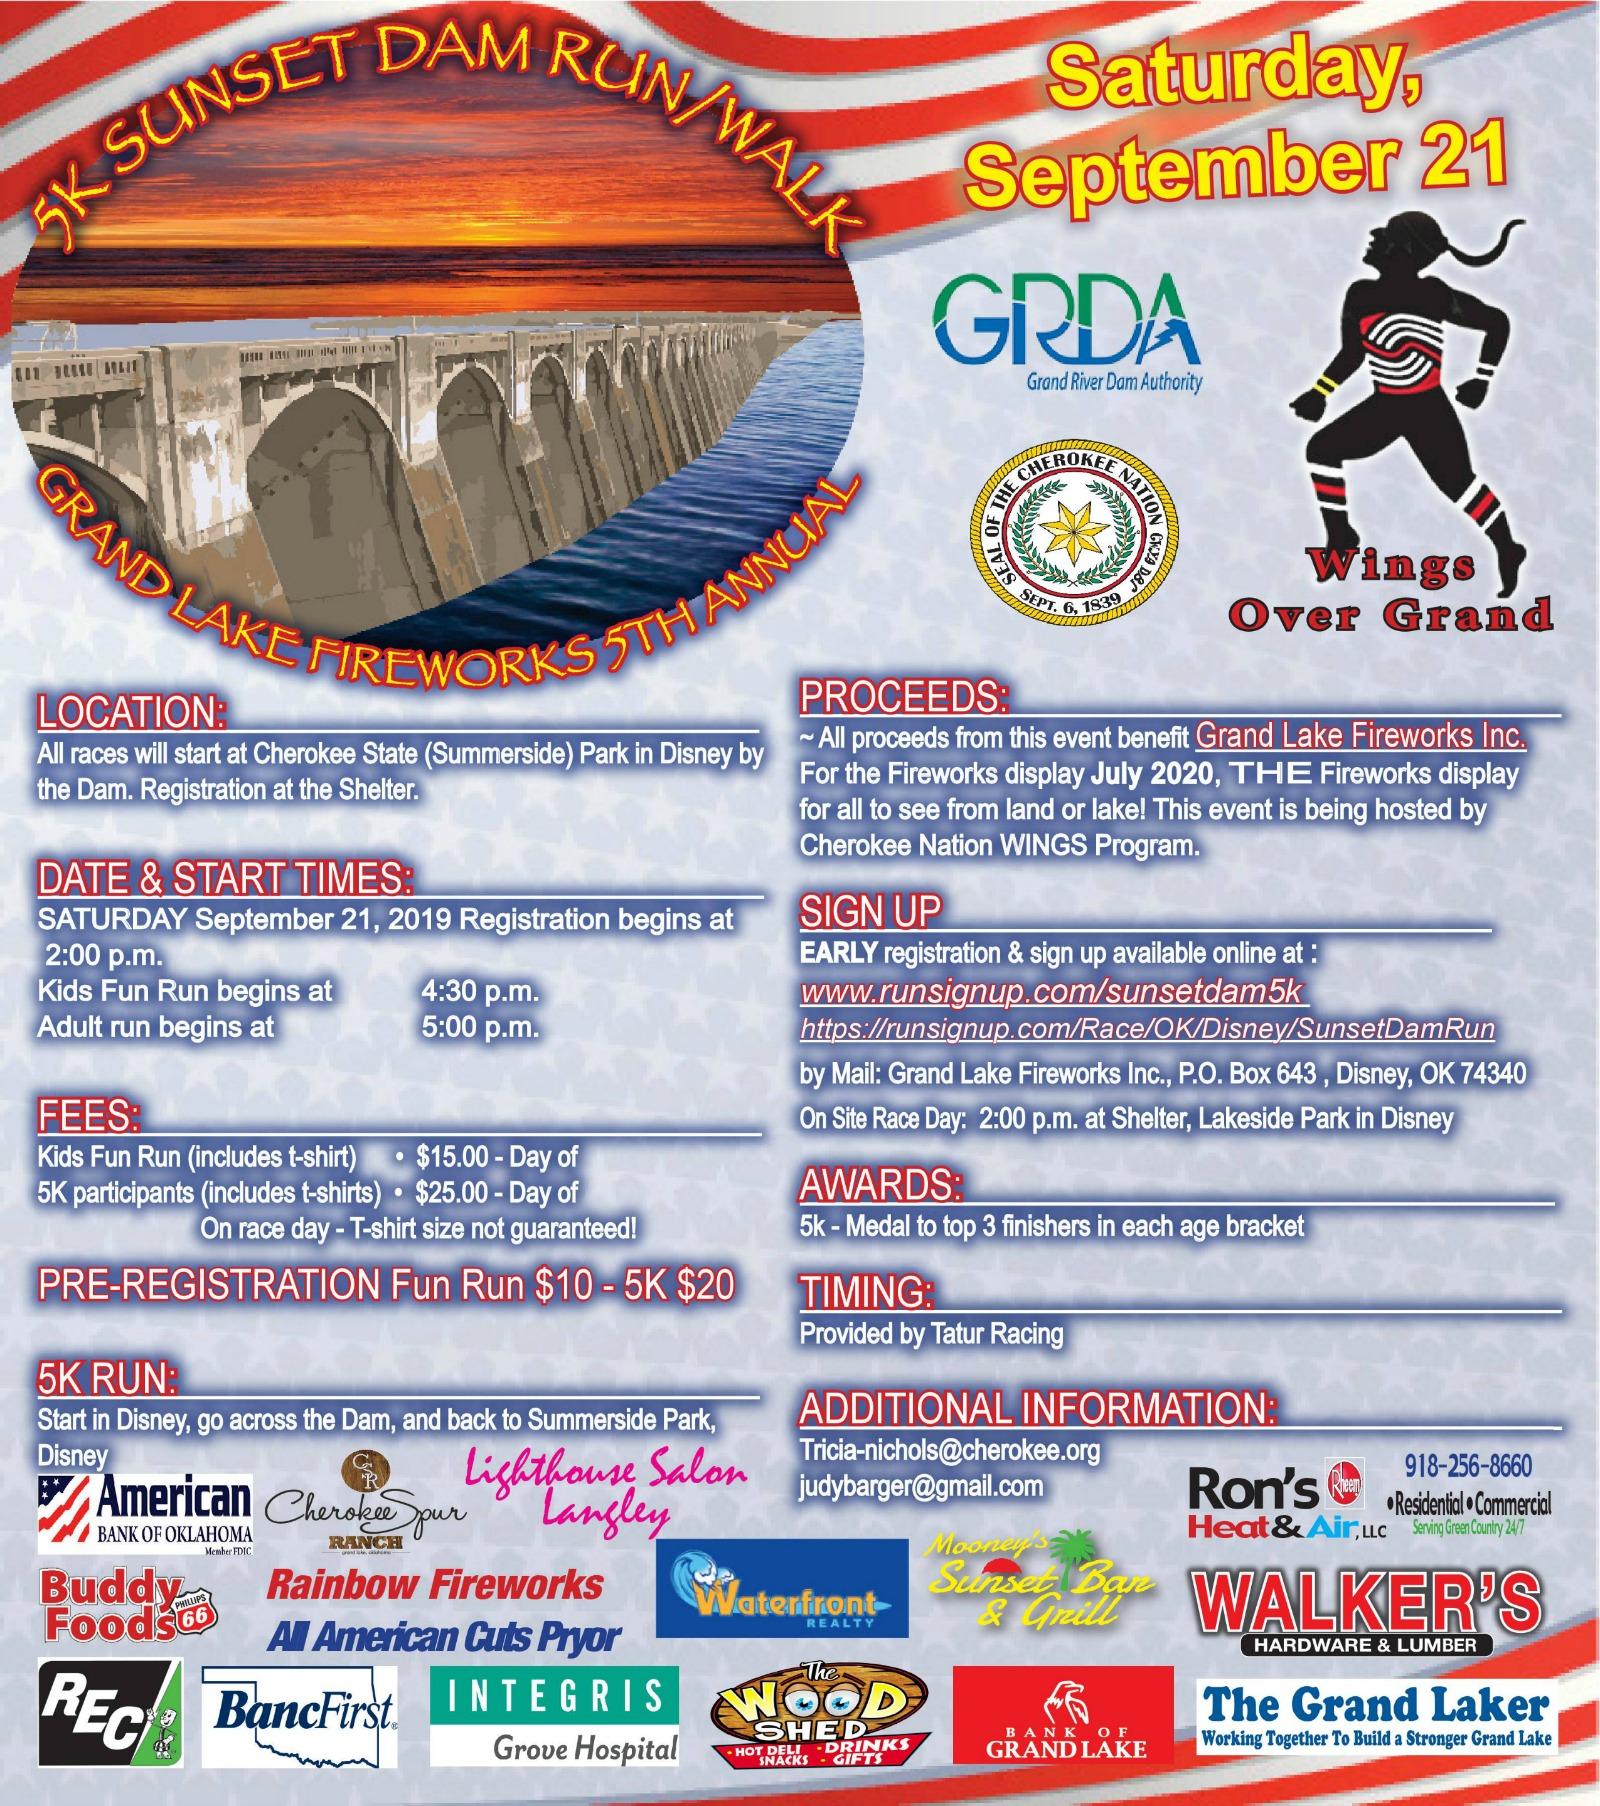 Grand Dam Run 5K 2019